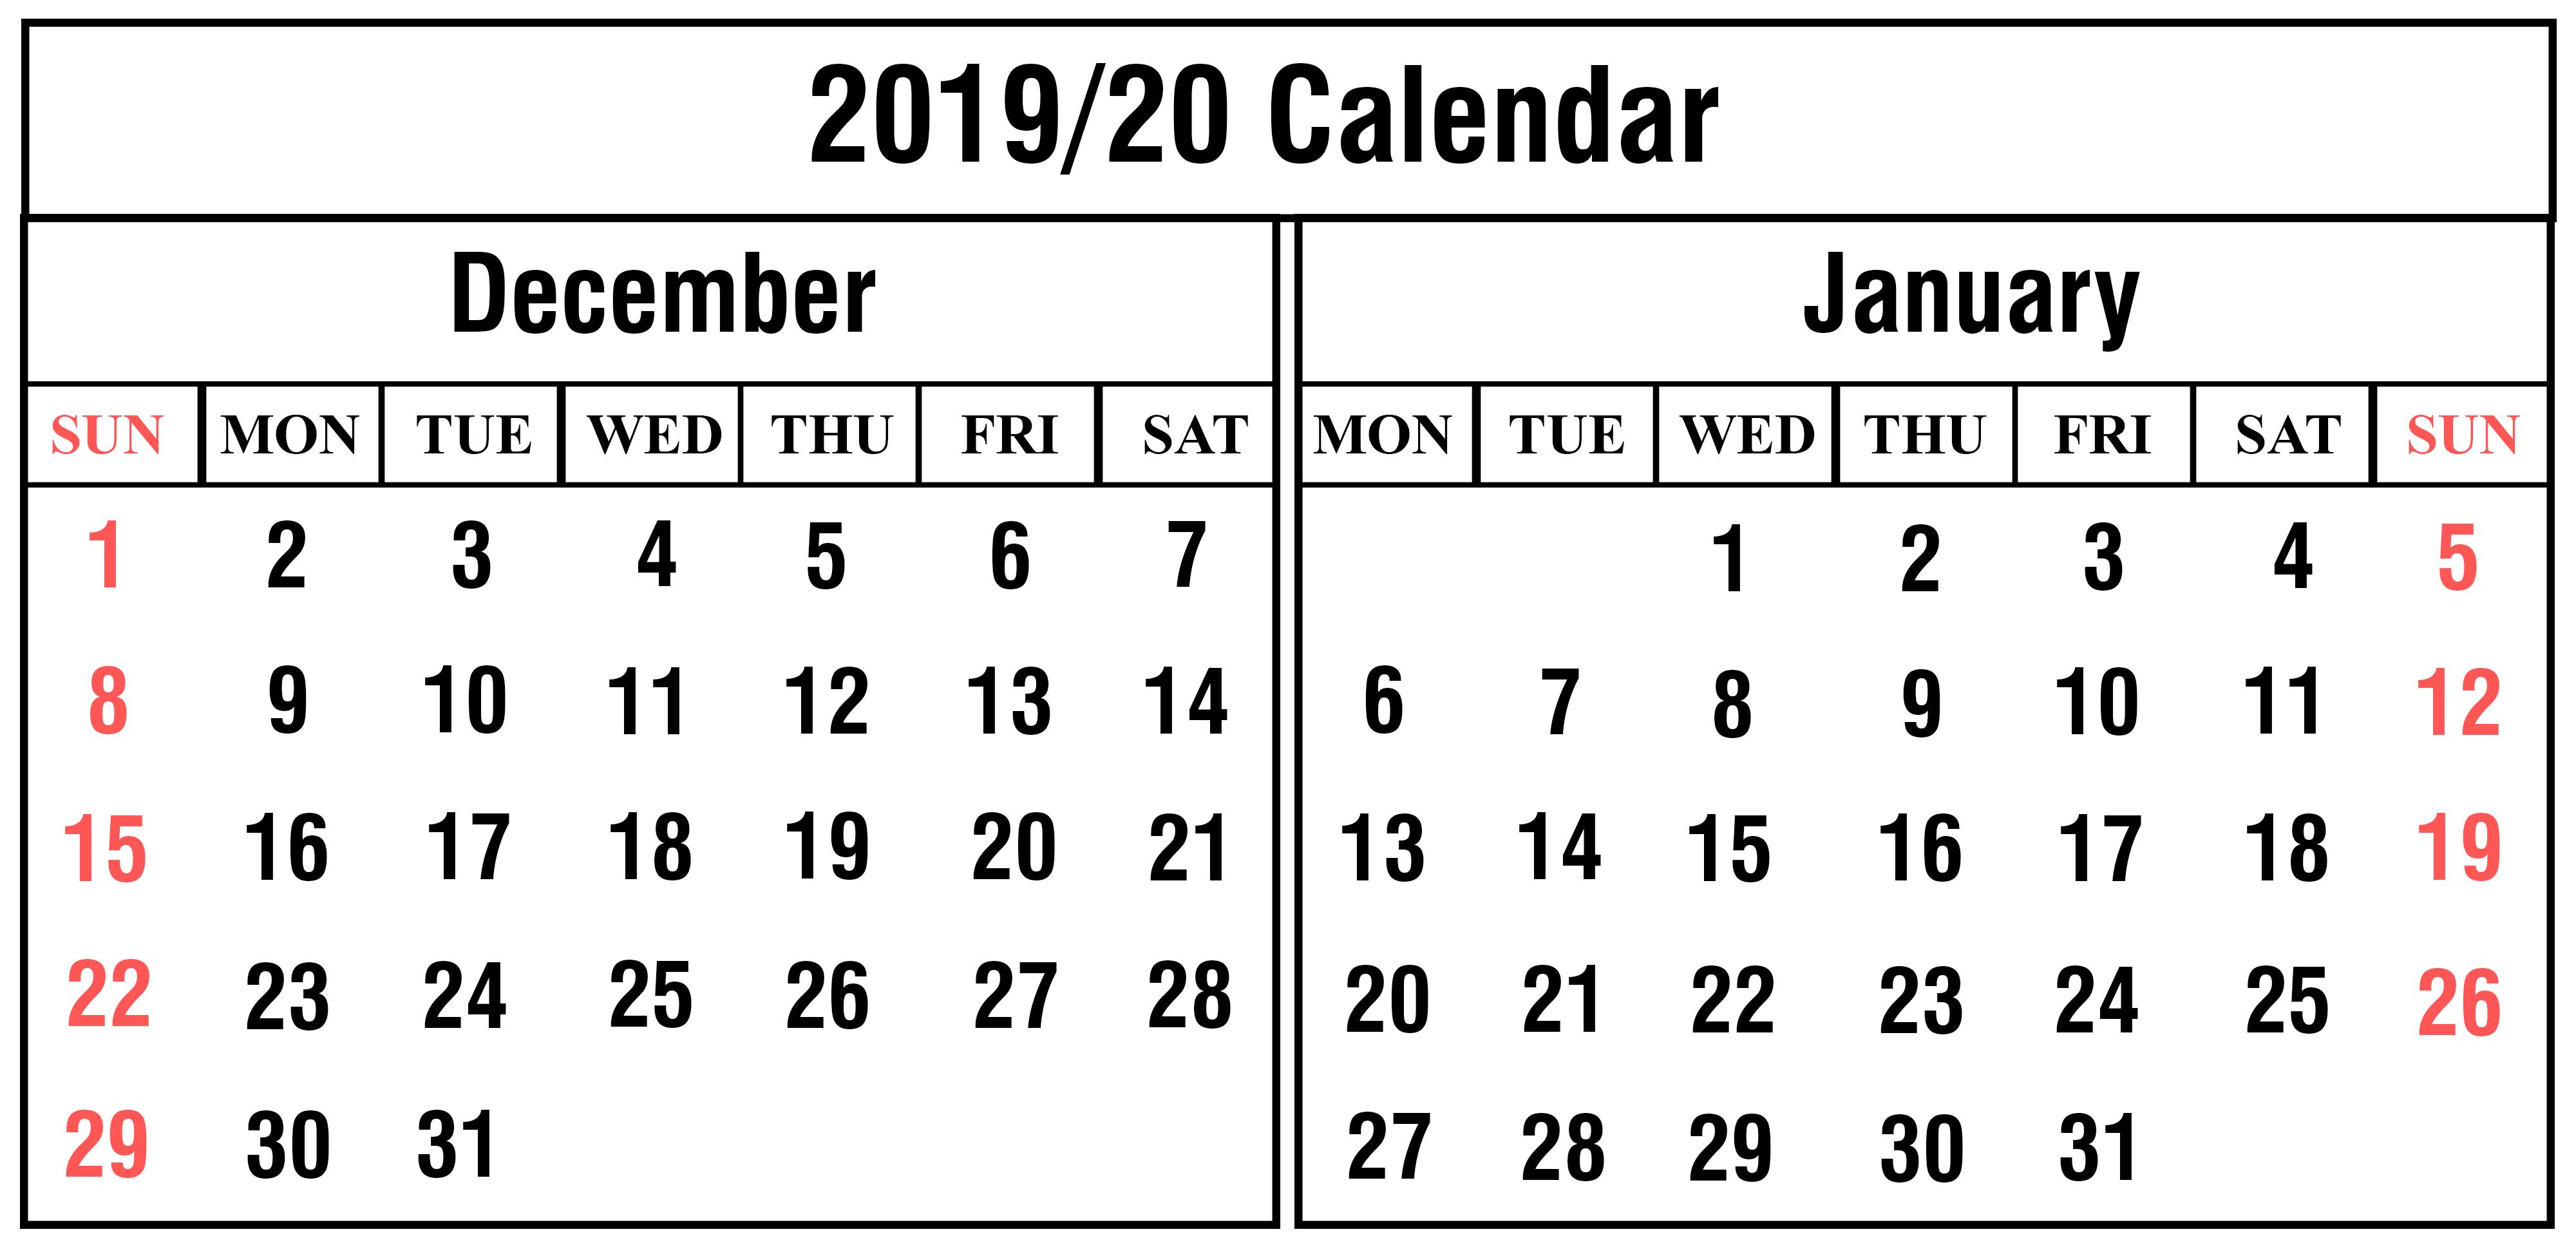 Blank December And January 2019-2020 Calendar Printable | Printable regarding Free Printable 2019-2020 Calendar With Editing